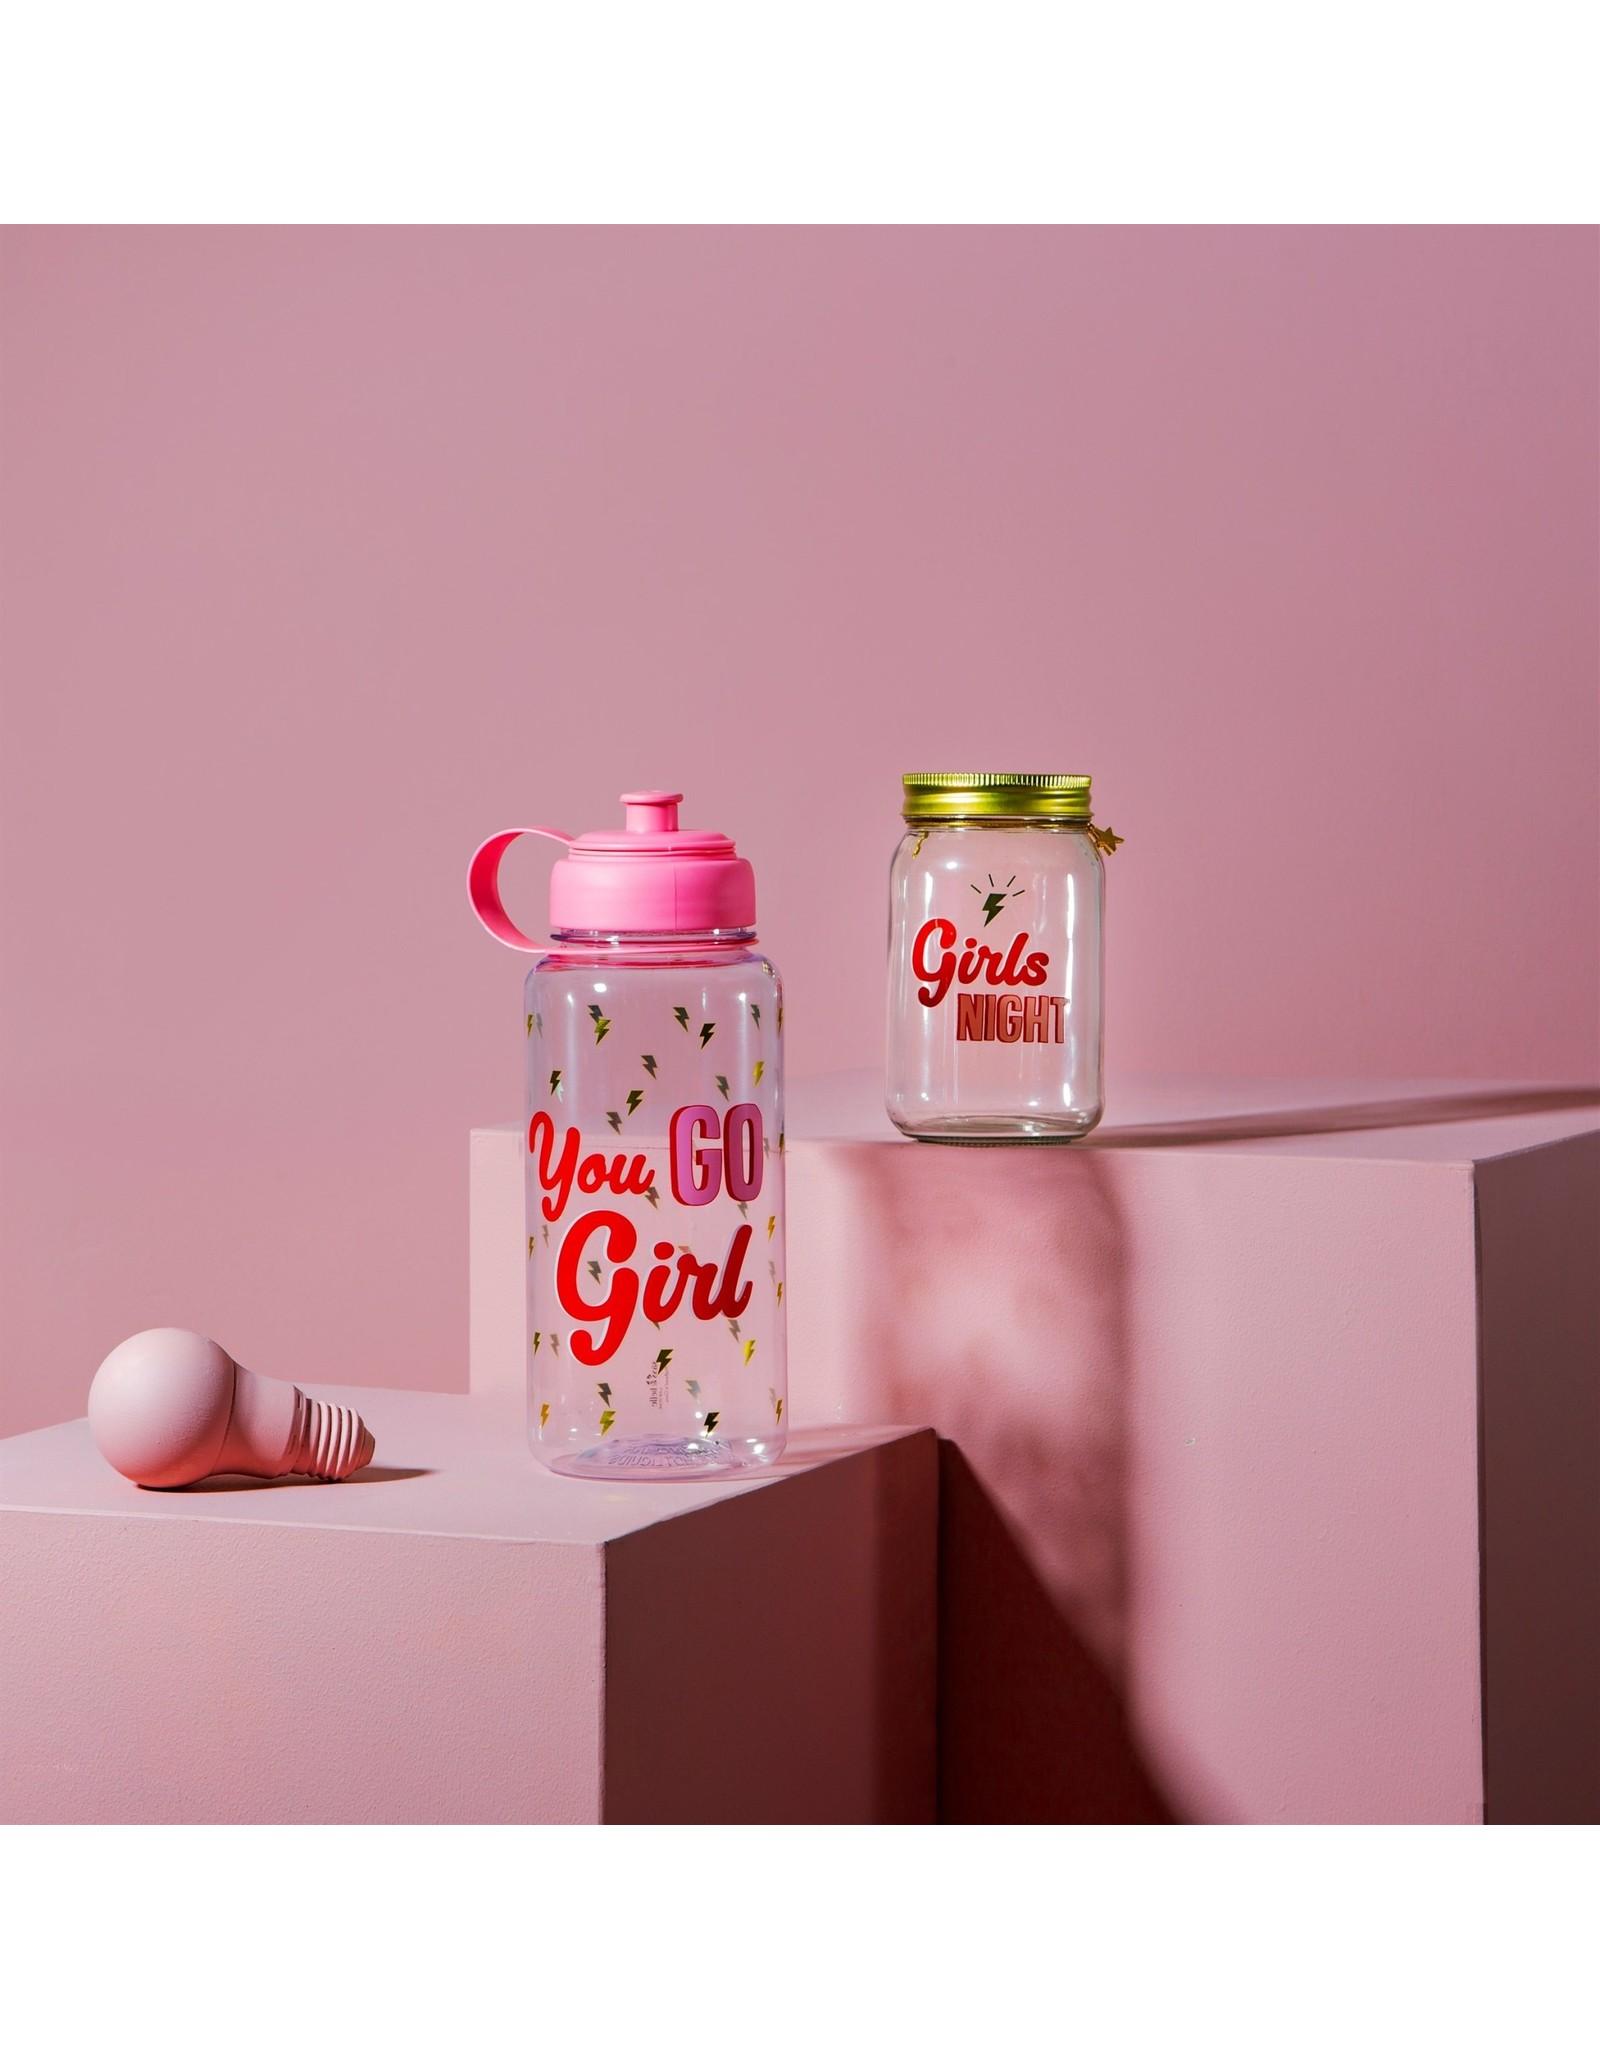 Sass & Belle bottle XL - you go girl